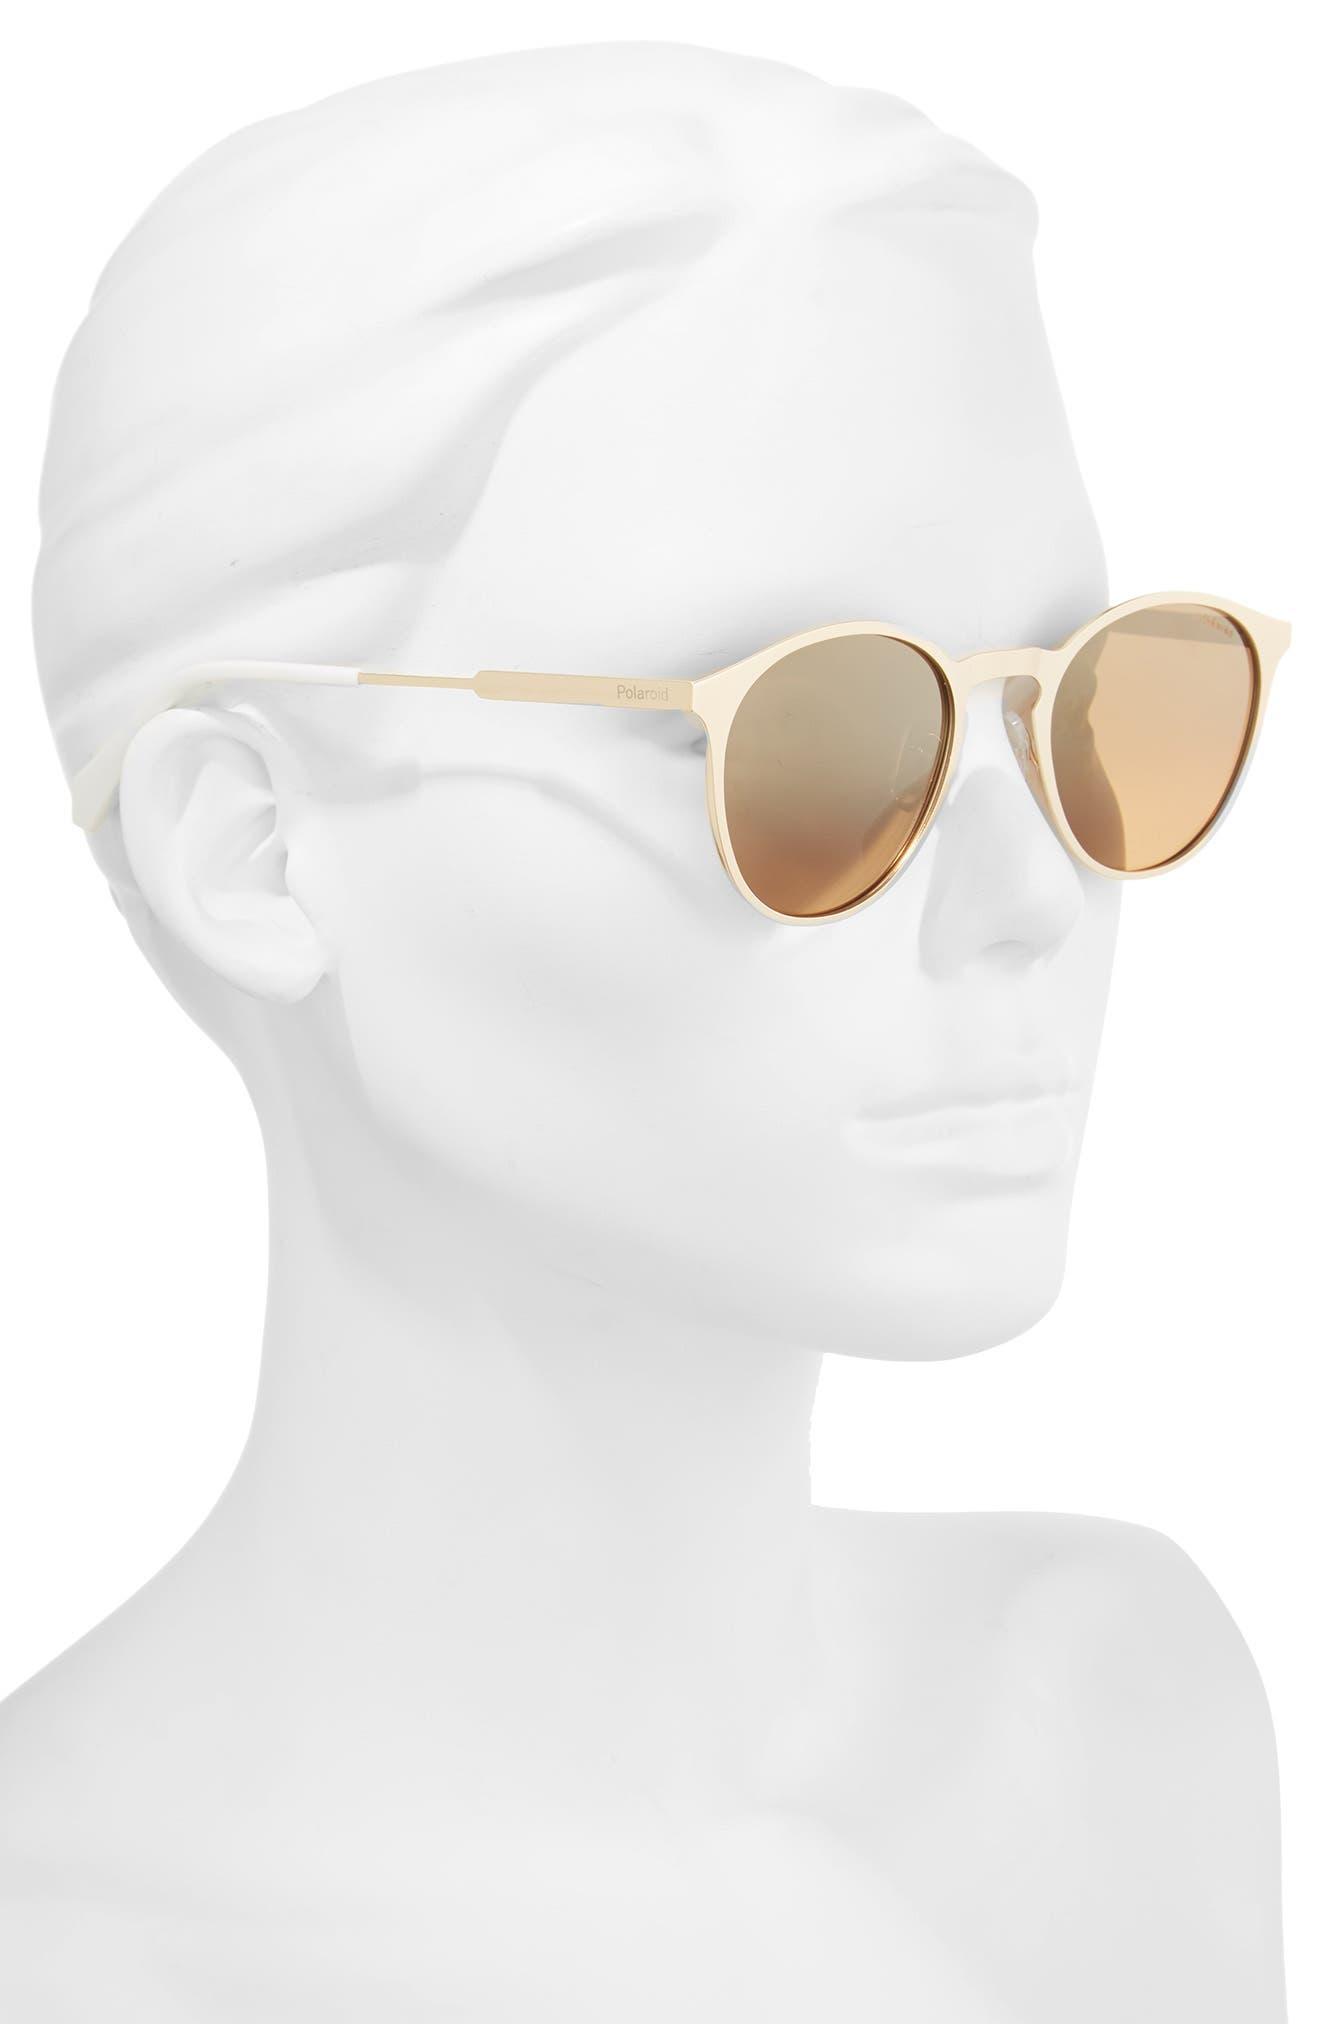 50mm Round Polarized Sunglasses,                             Alternate thumbnail 2, color,                             GOLD